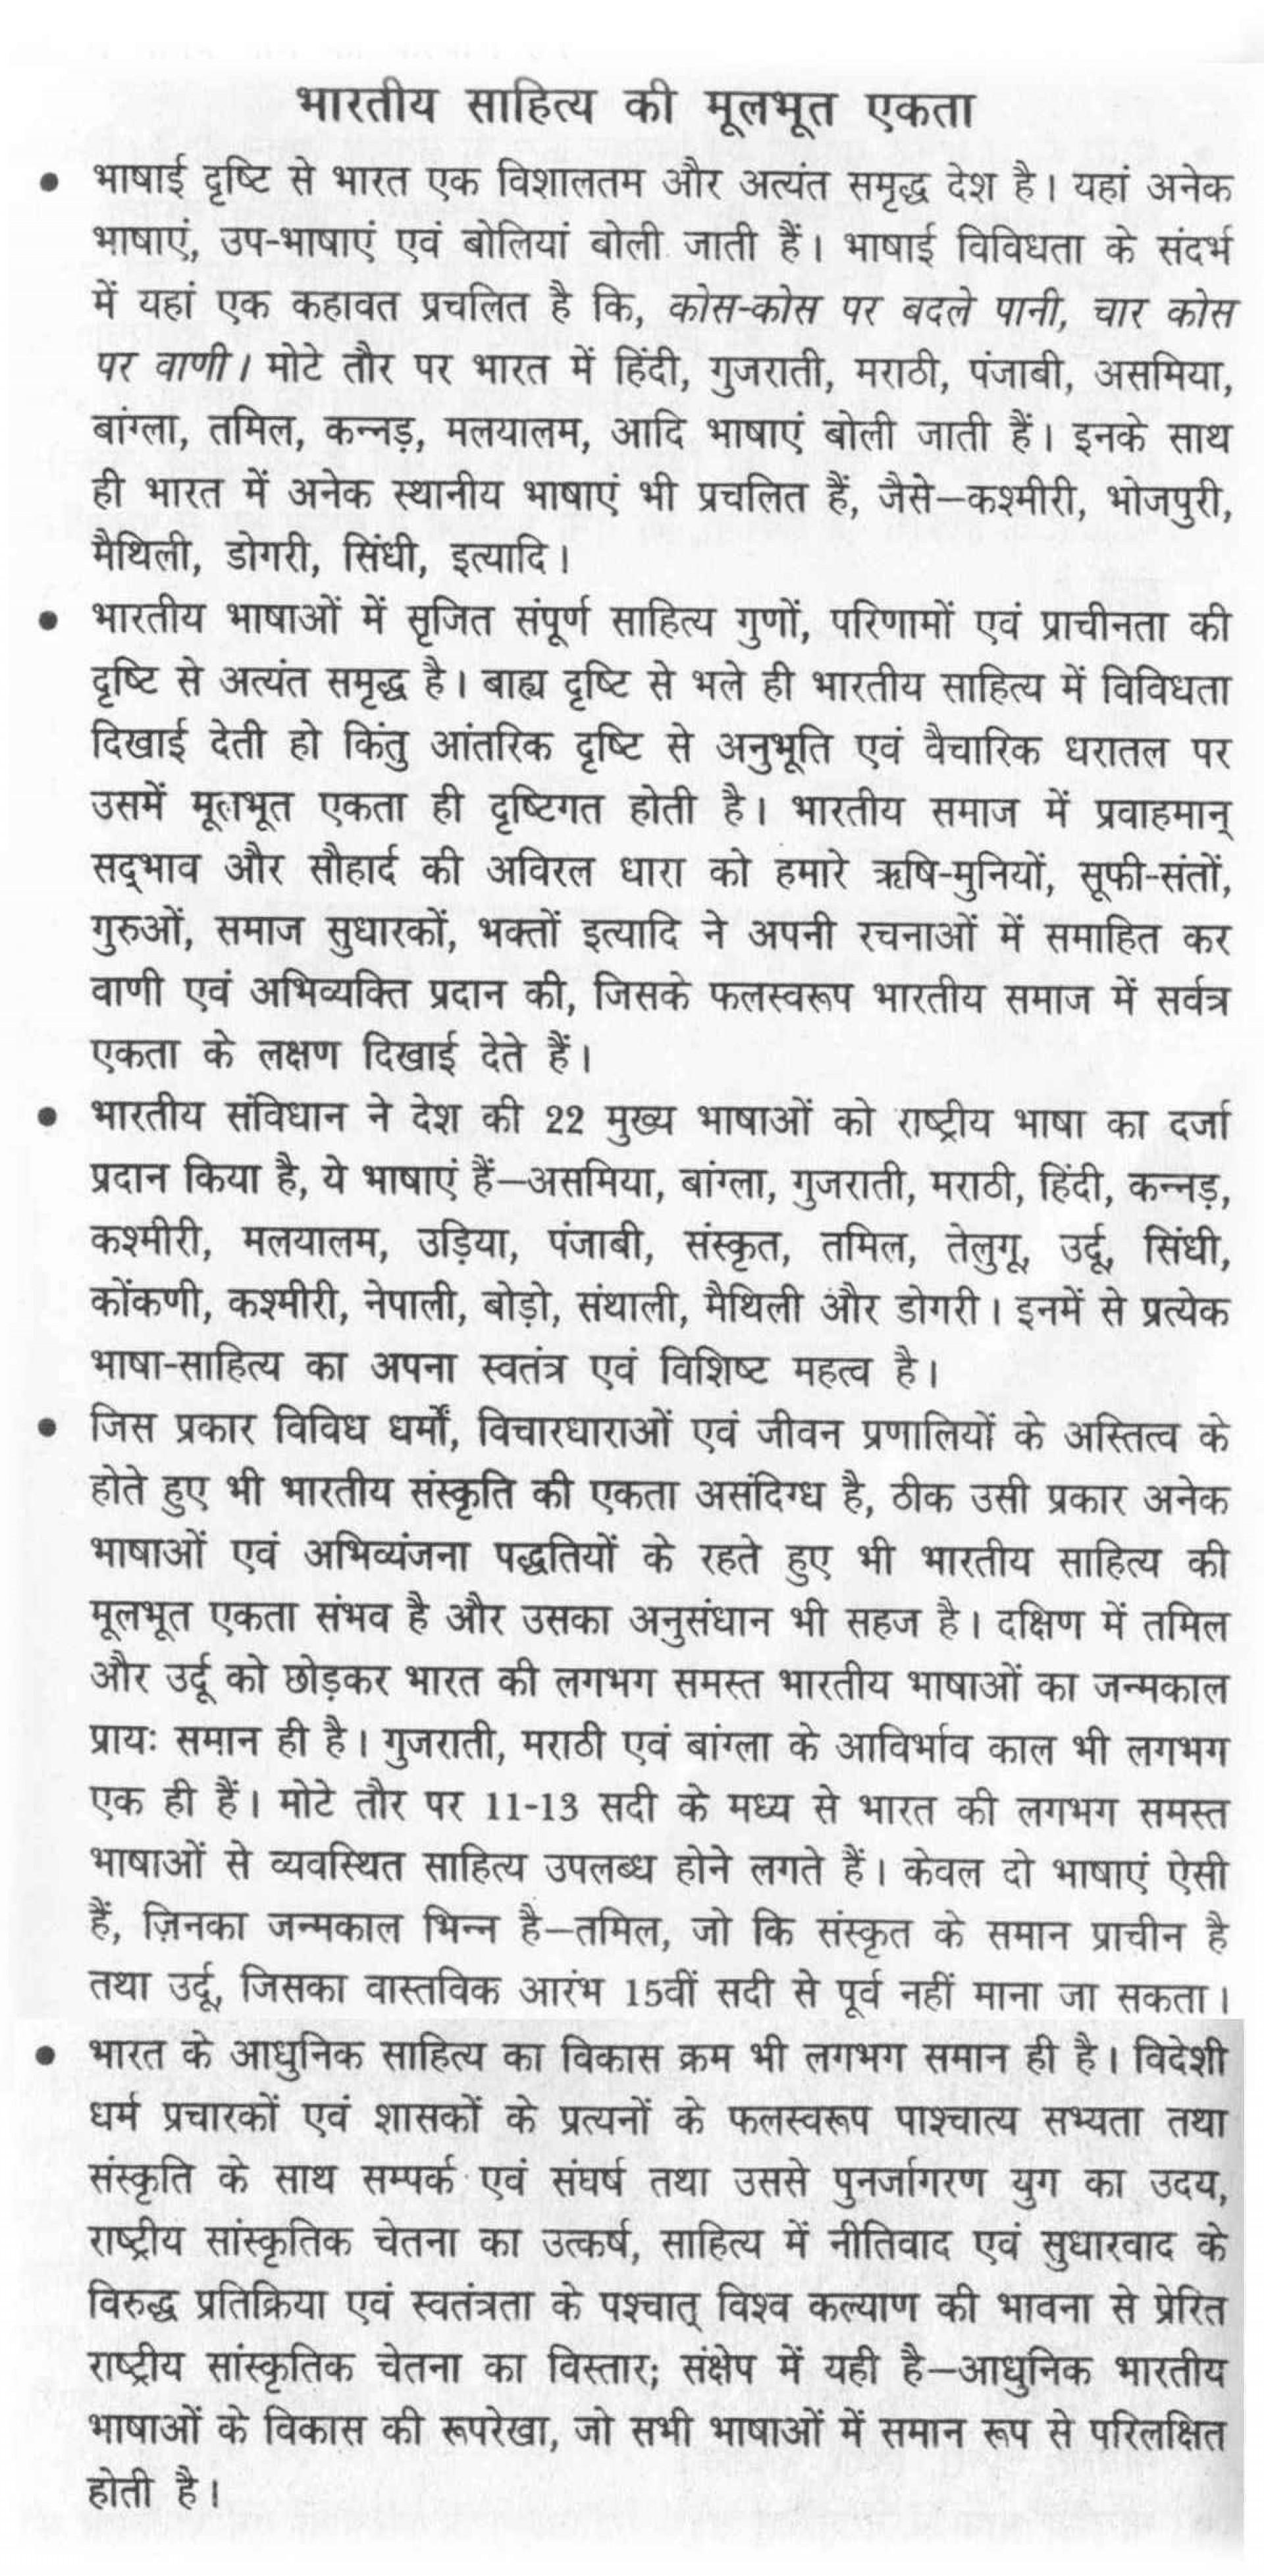 004 Greed Essay Example 11 Thumb2 Awful Greedy Dog In Hindi Topics Is A Curse 1920